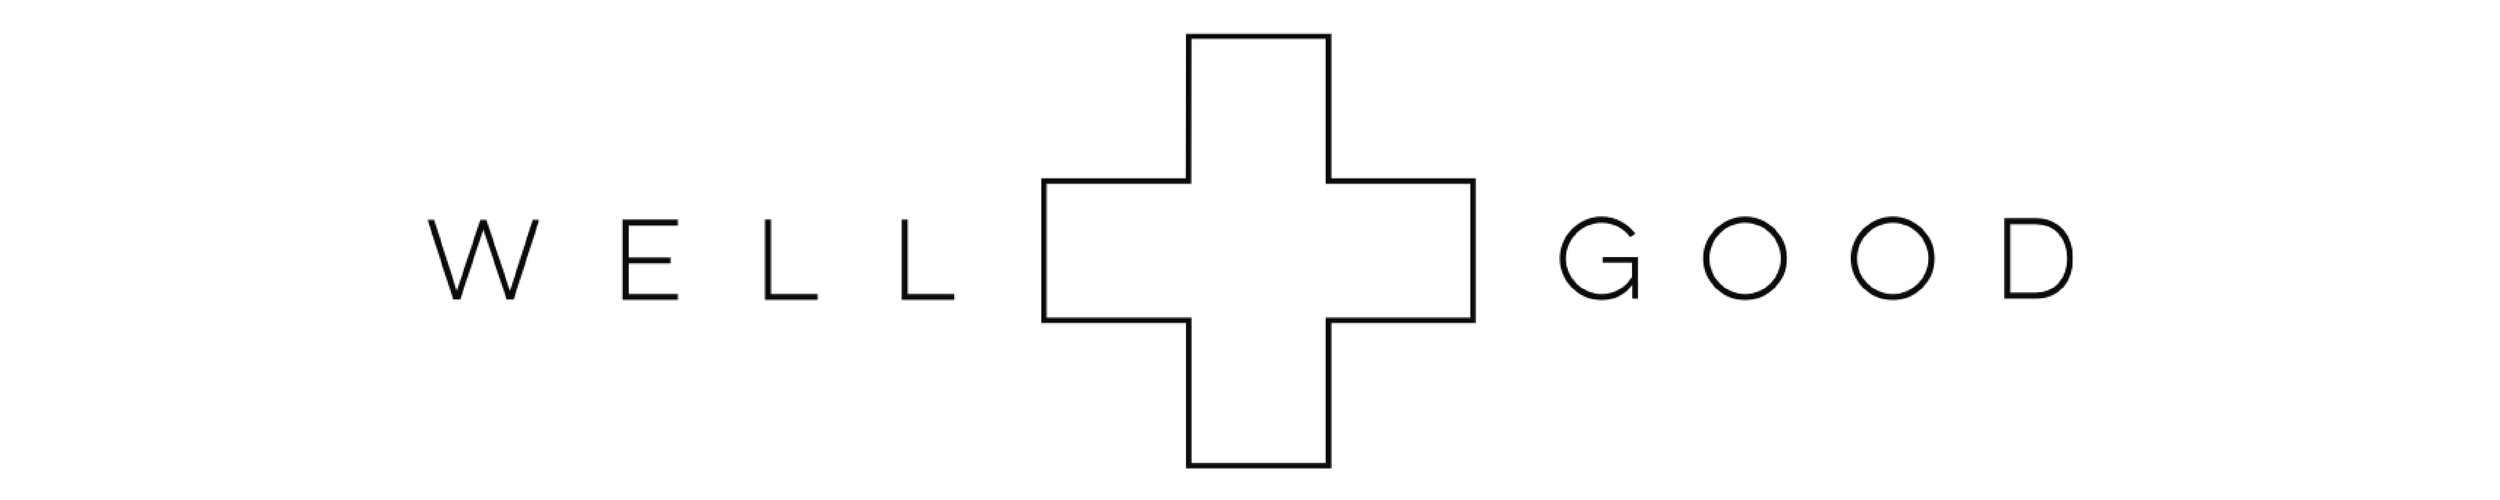 well_and_good_logo-01.jpg